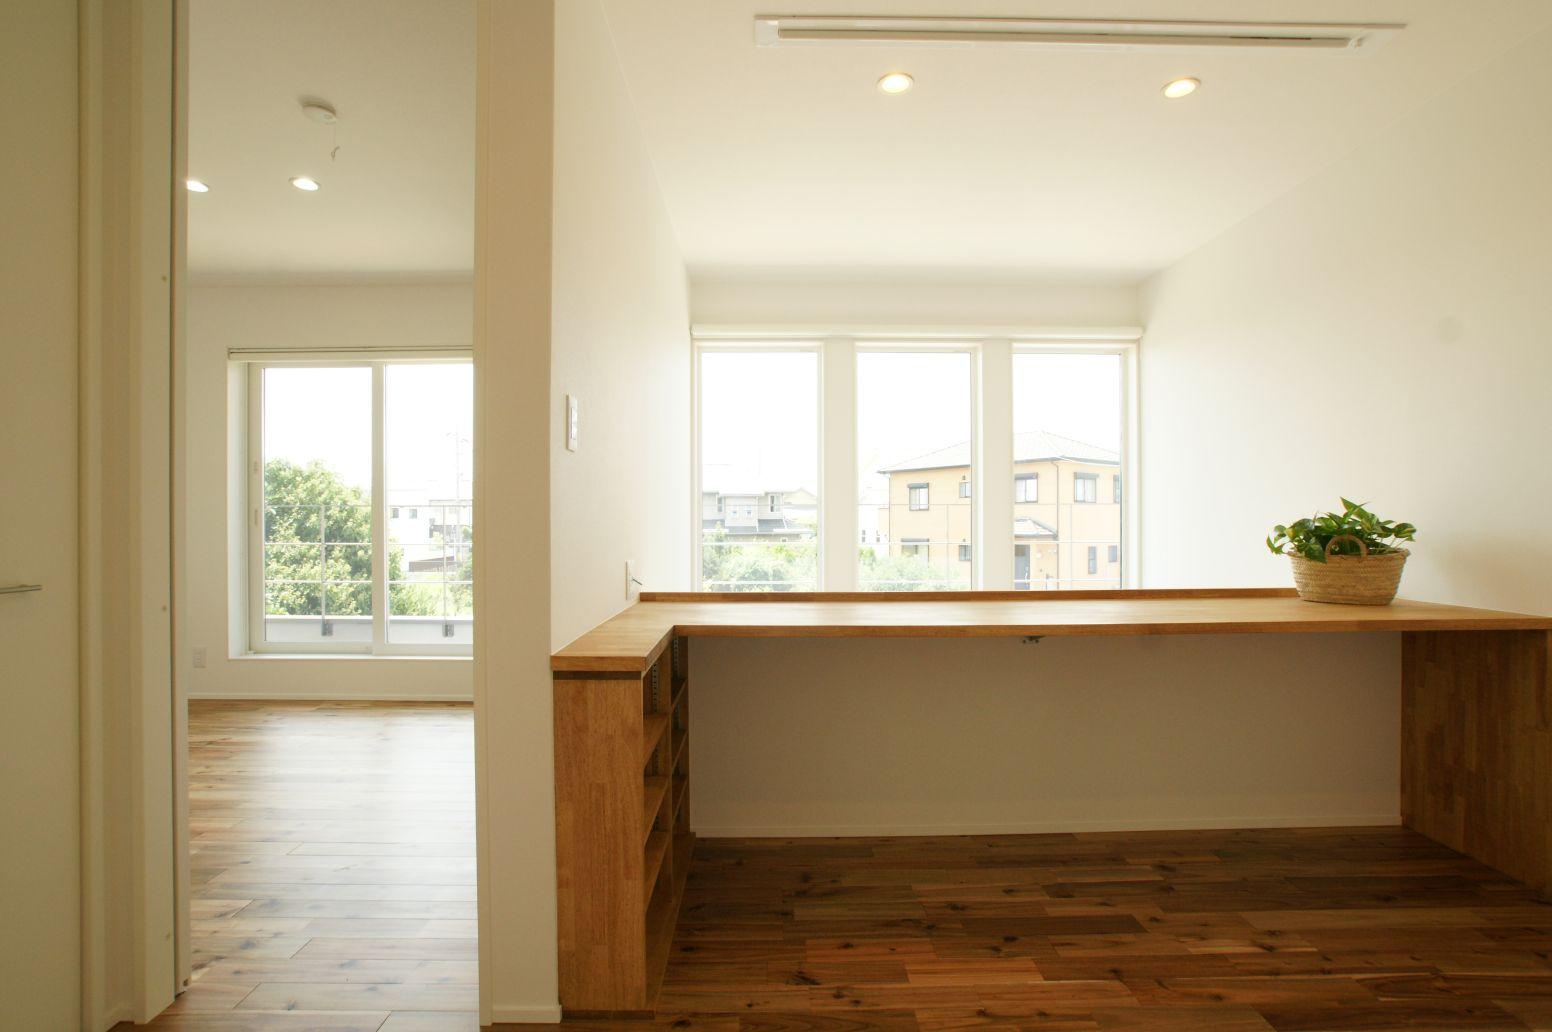 RIKYU (リキュー)【デザイン住宅、建築家、インテリア】フリースペースの有効活用の提案も同社だからこそ